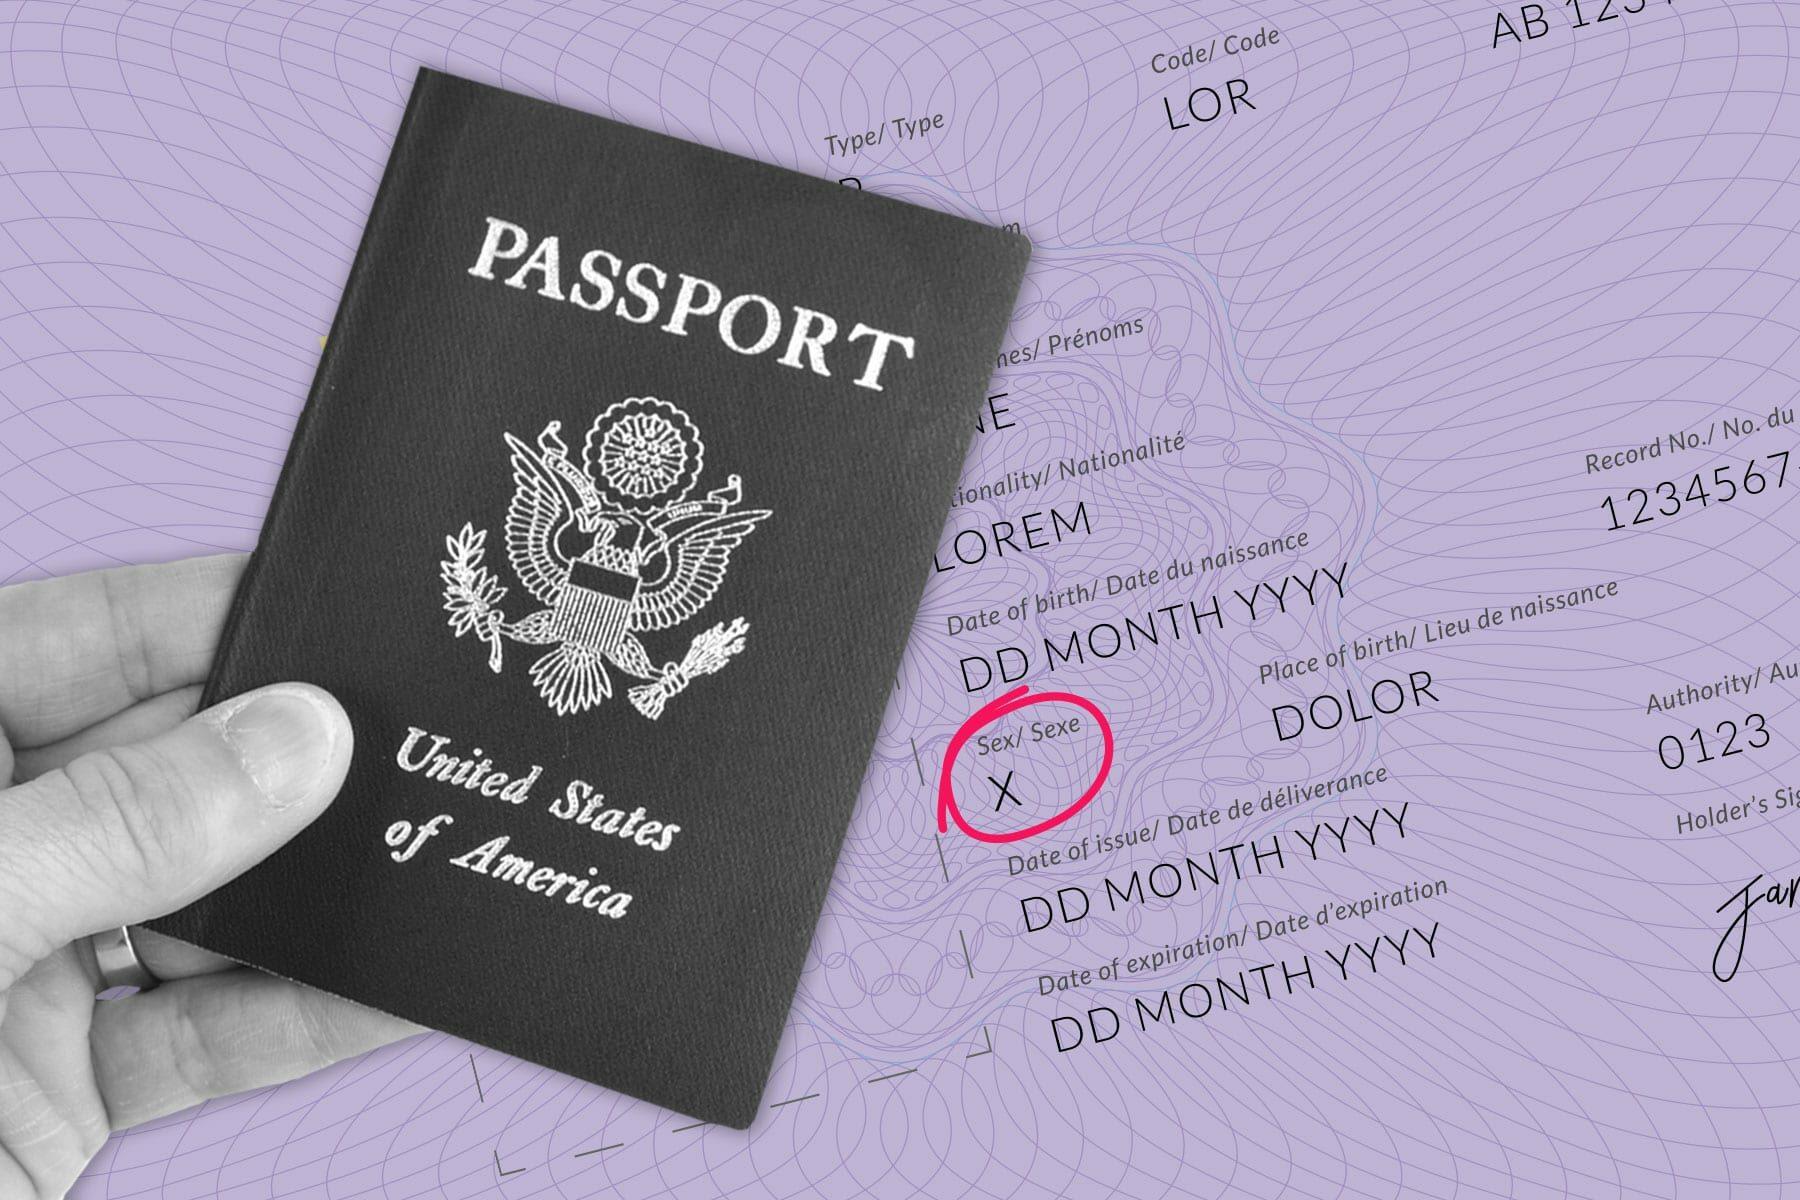 Image of passport and gender marker